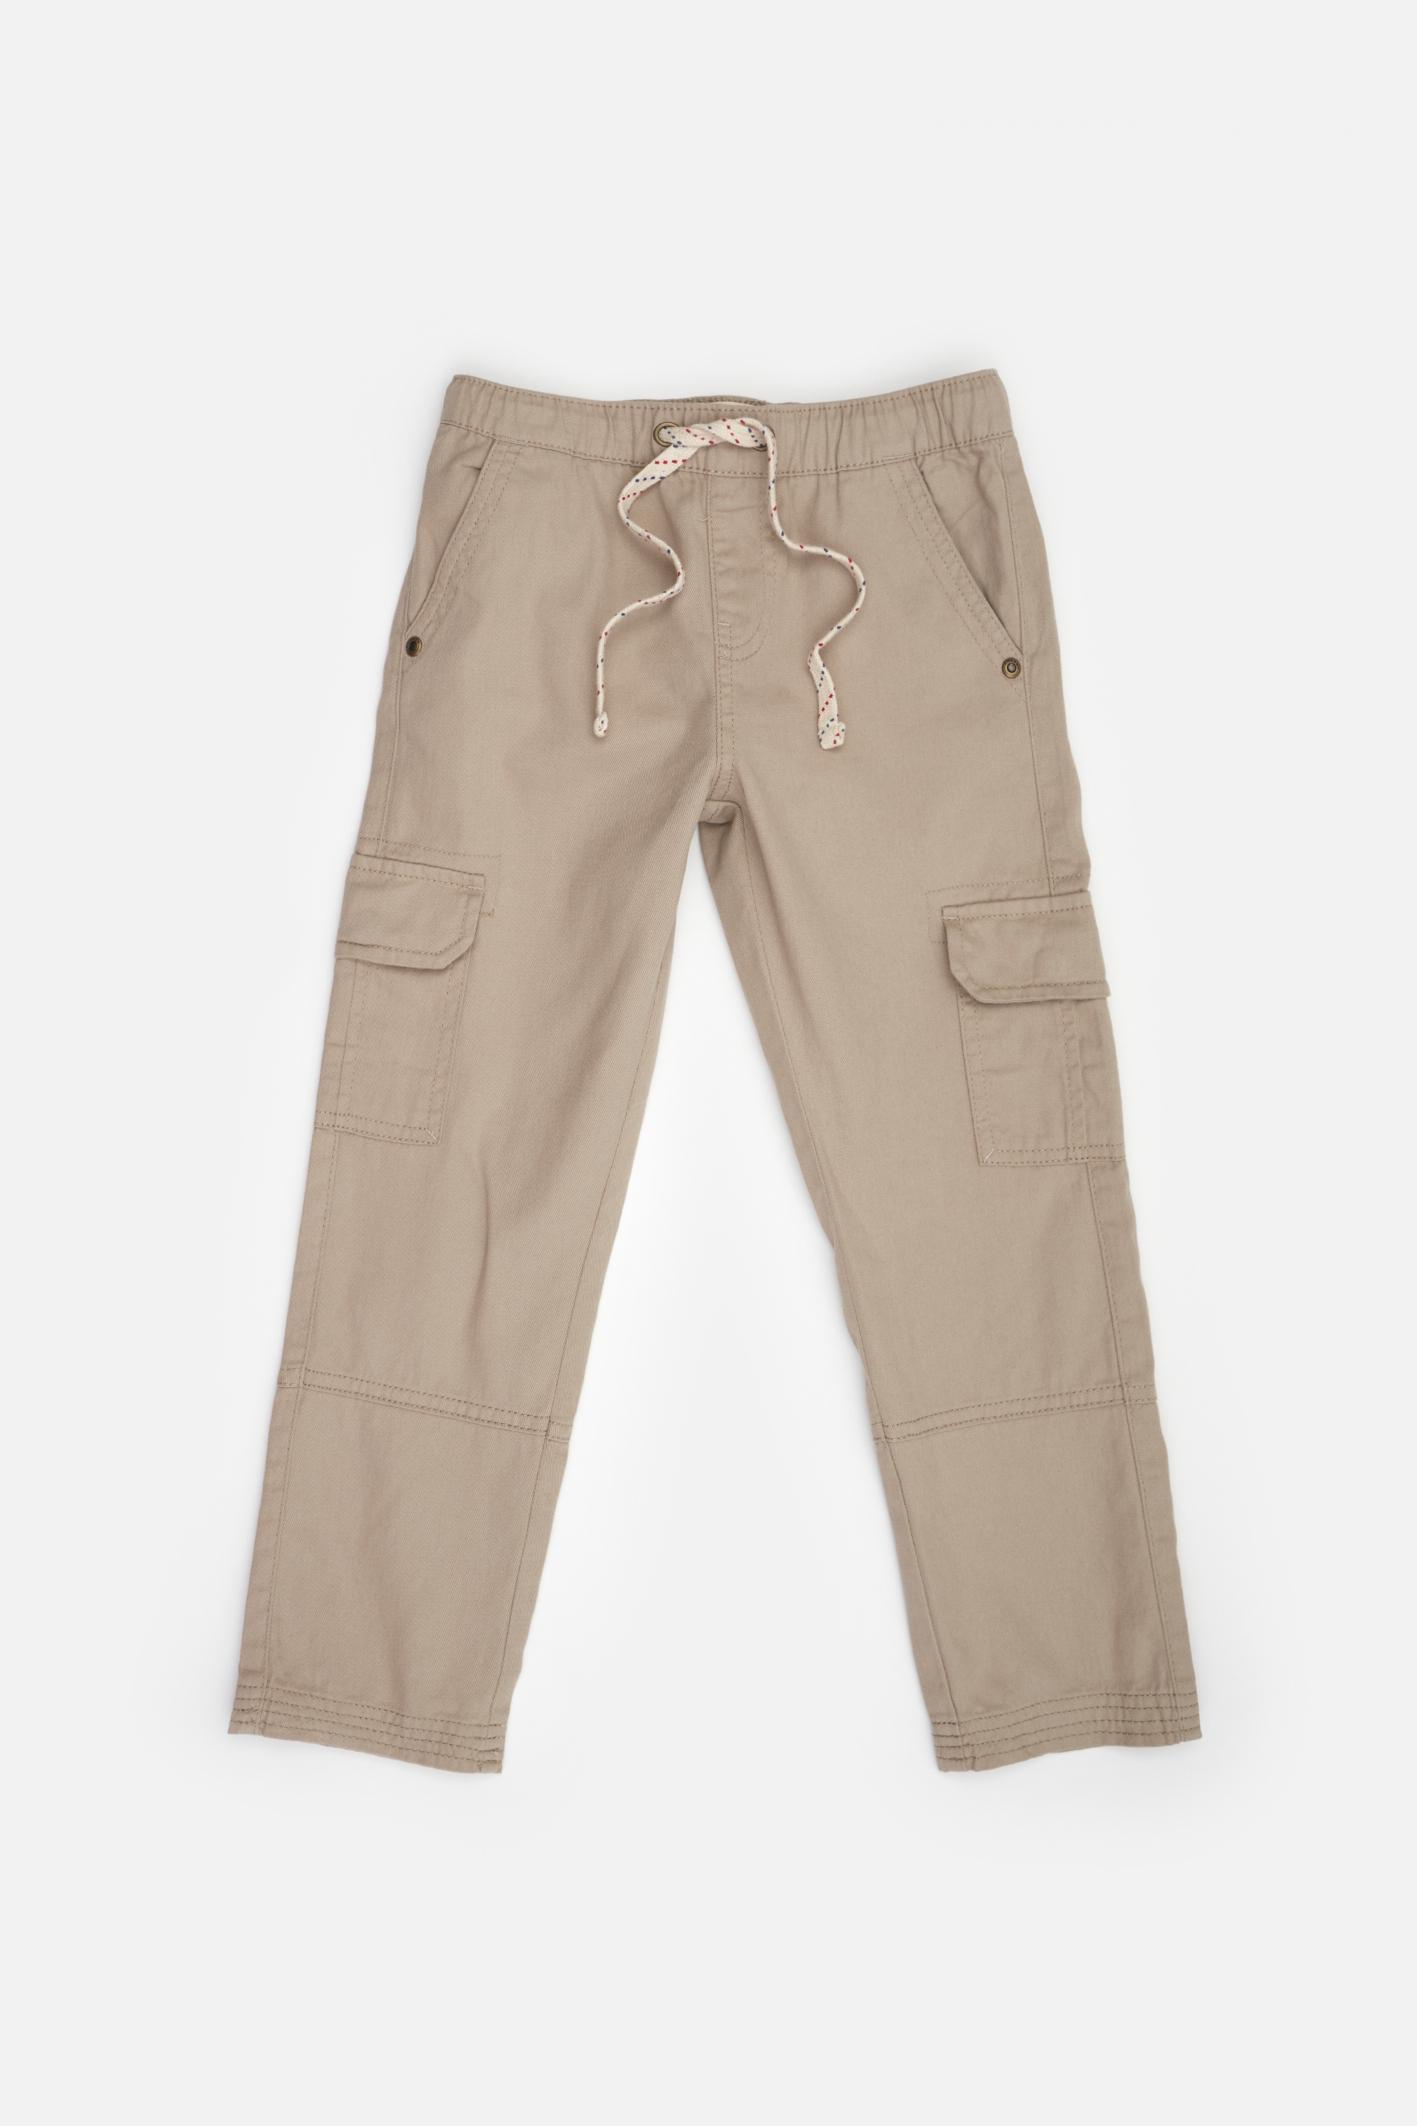 cheeky_pantalon-gabardina-brent-4-12_08-25-2021__picture-80277